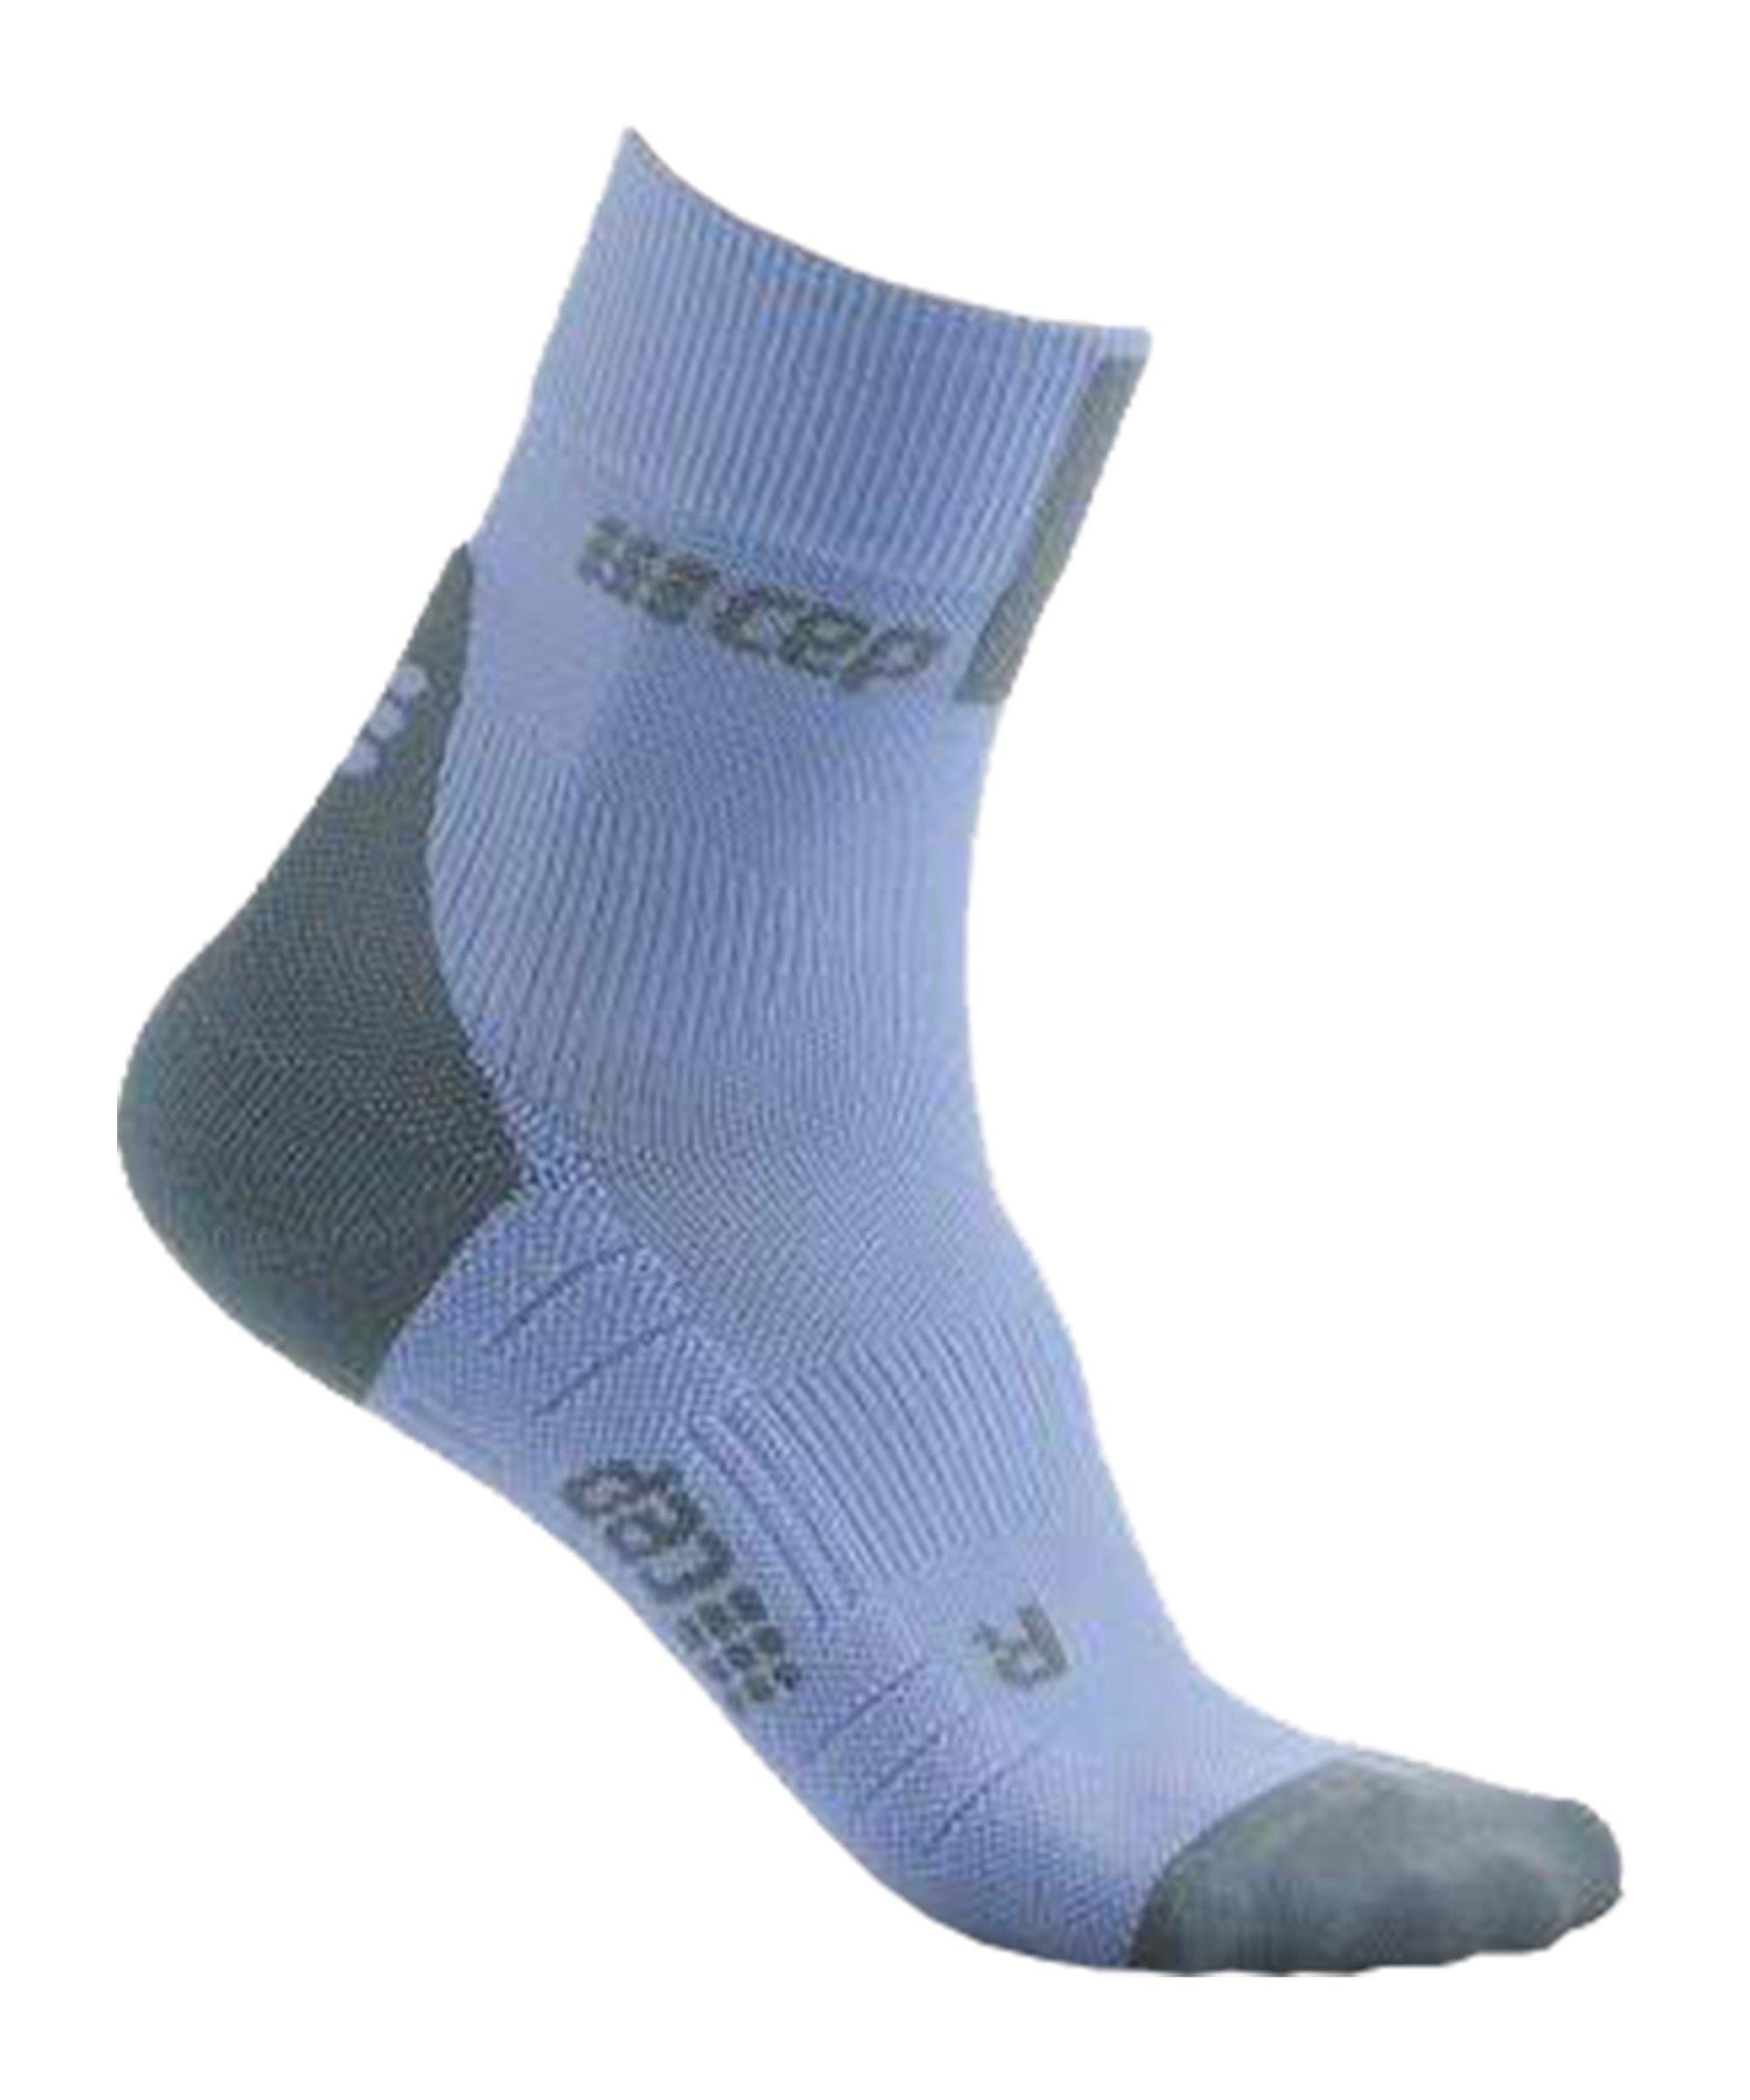 CEP Comp. 3.0 Short Socken Running Damen Blau - blau